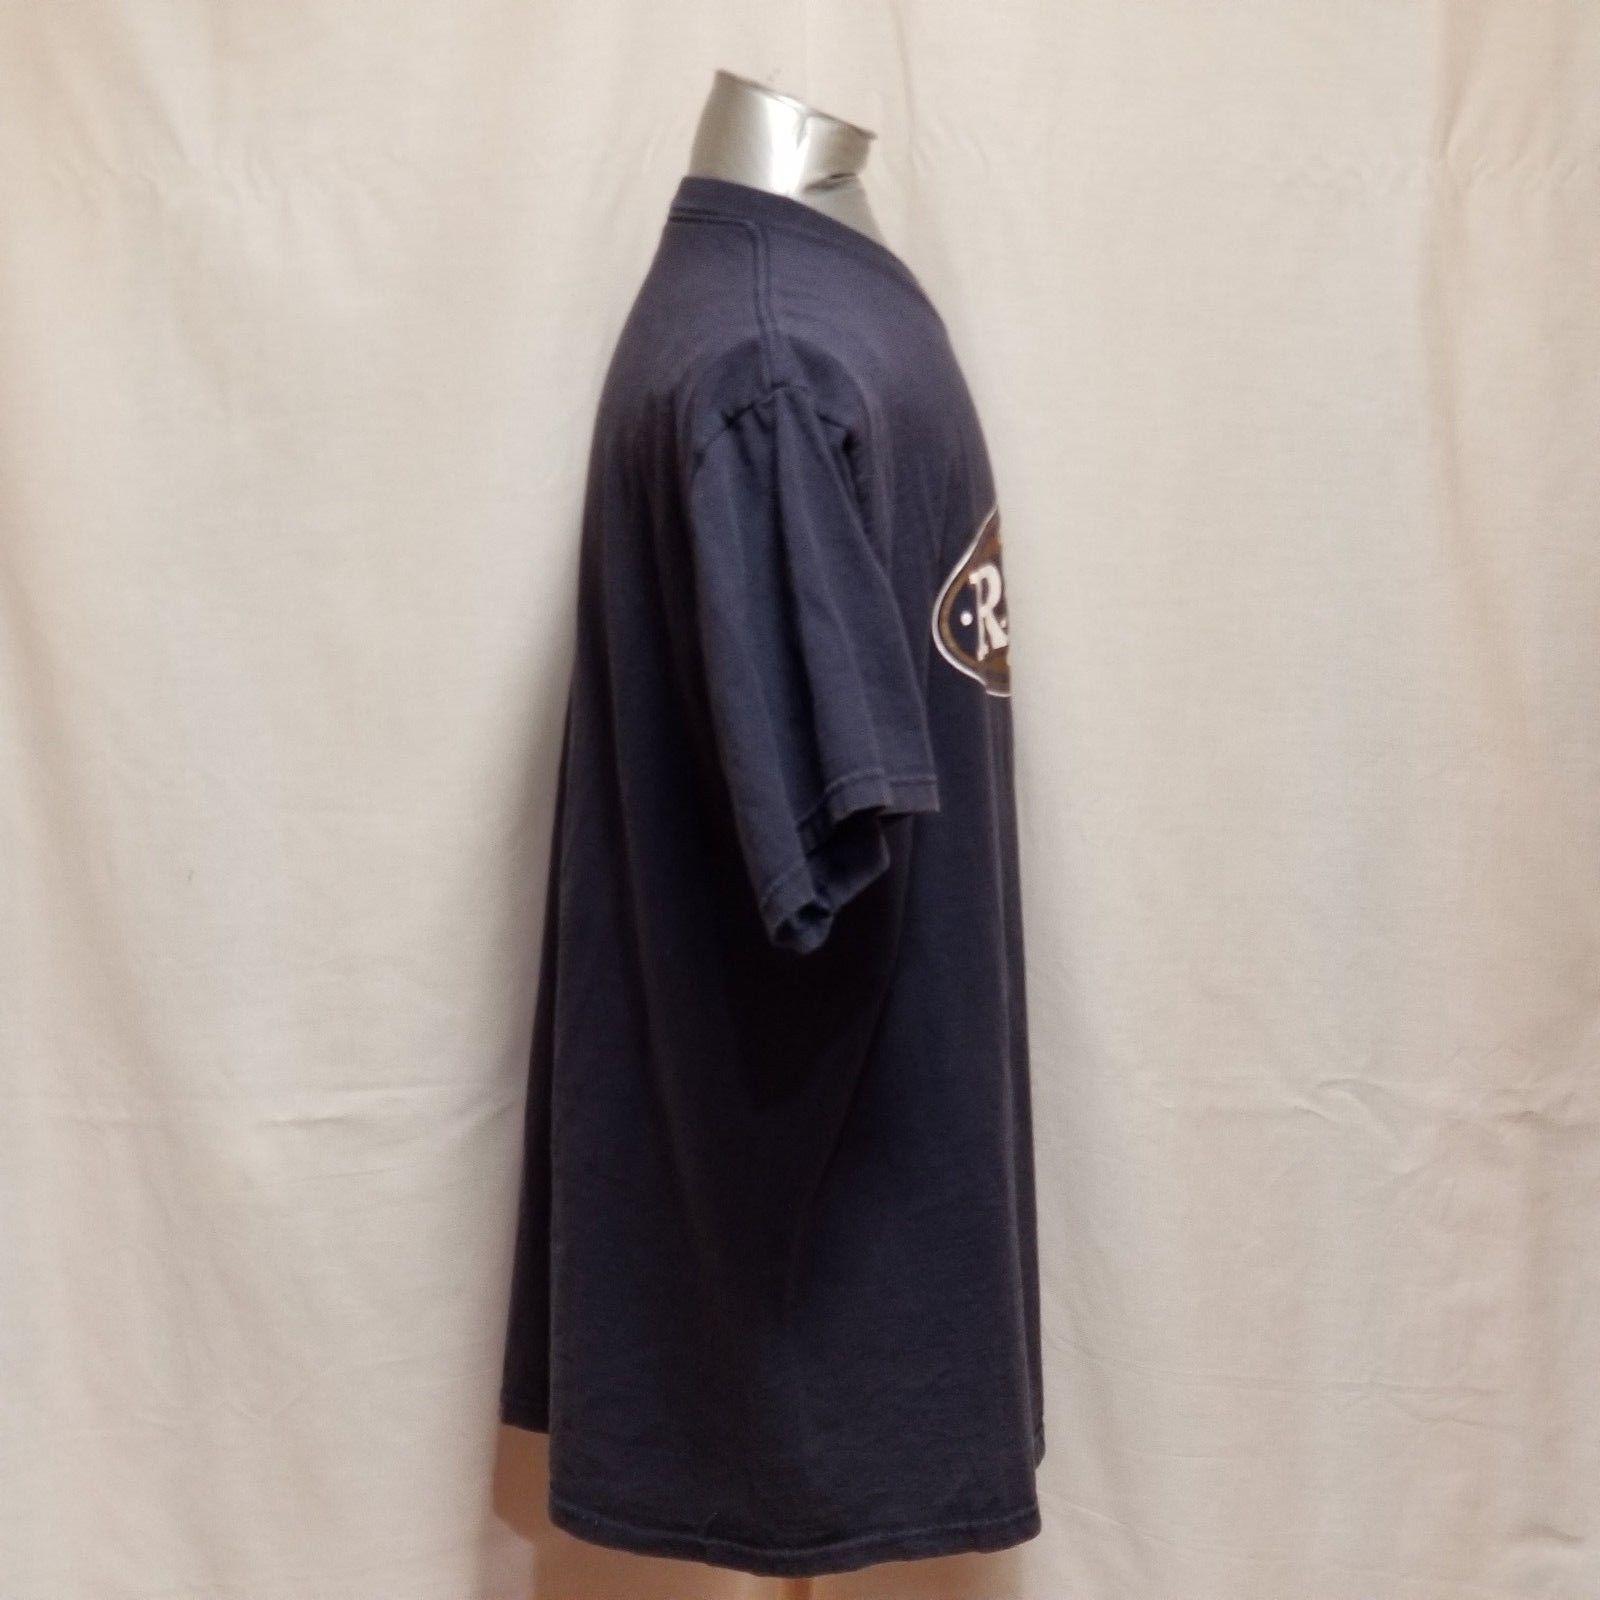 St. Louis Rams NFL Football Mens Size XL Blue Short Sleeve T Shirt image 5